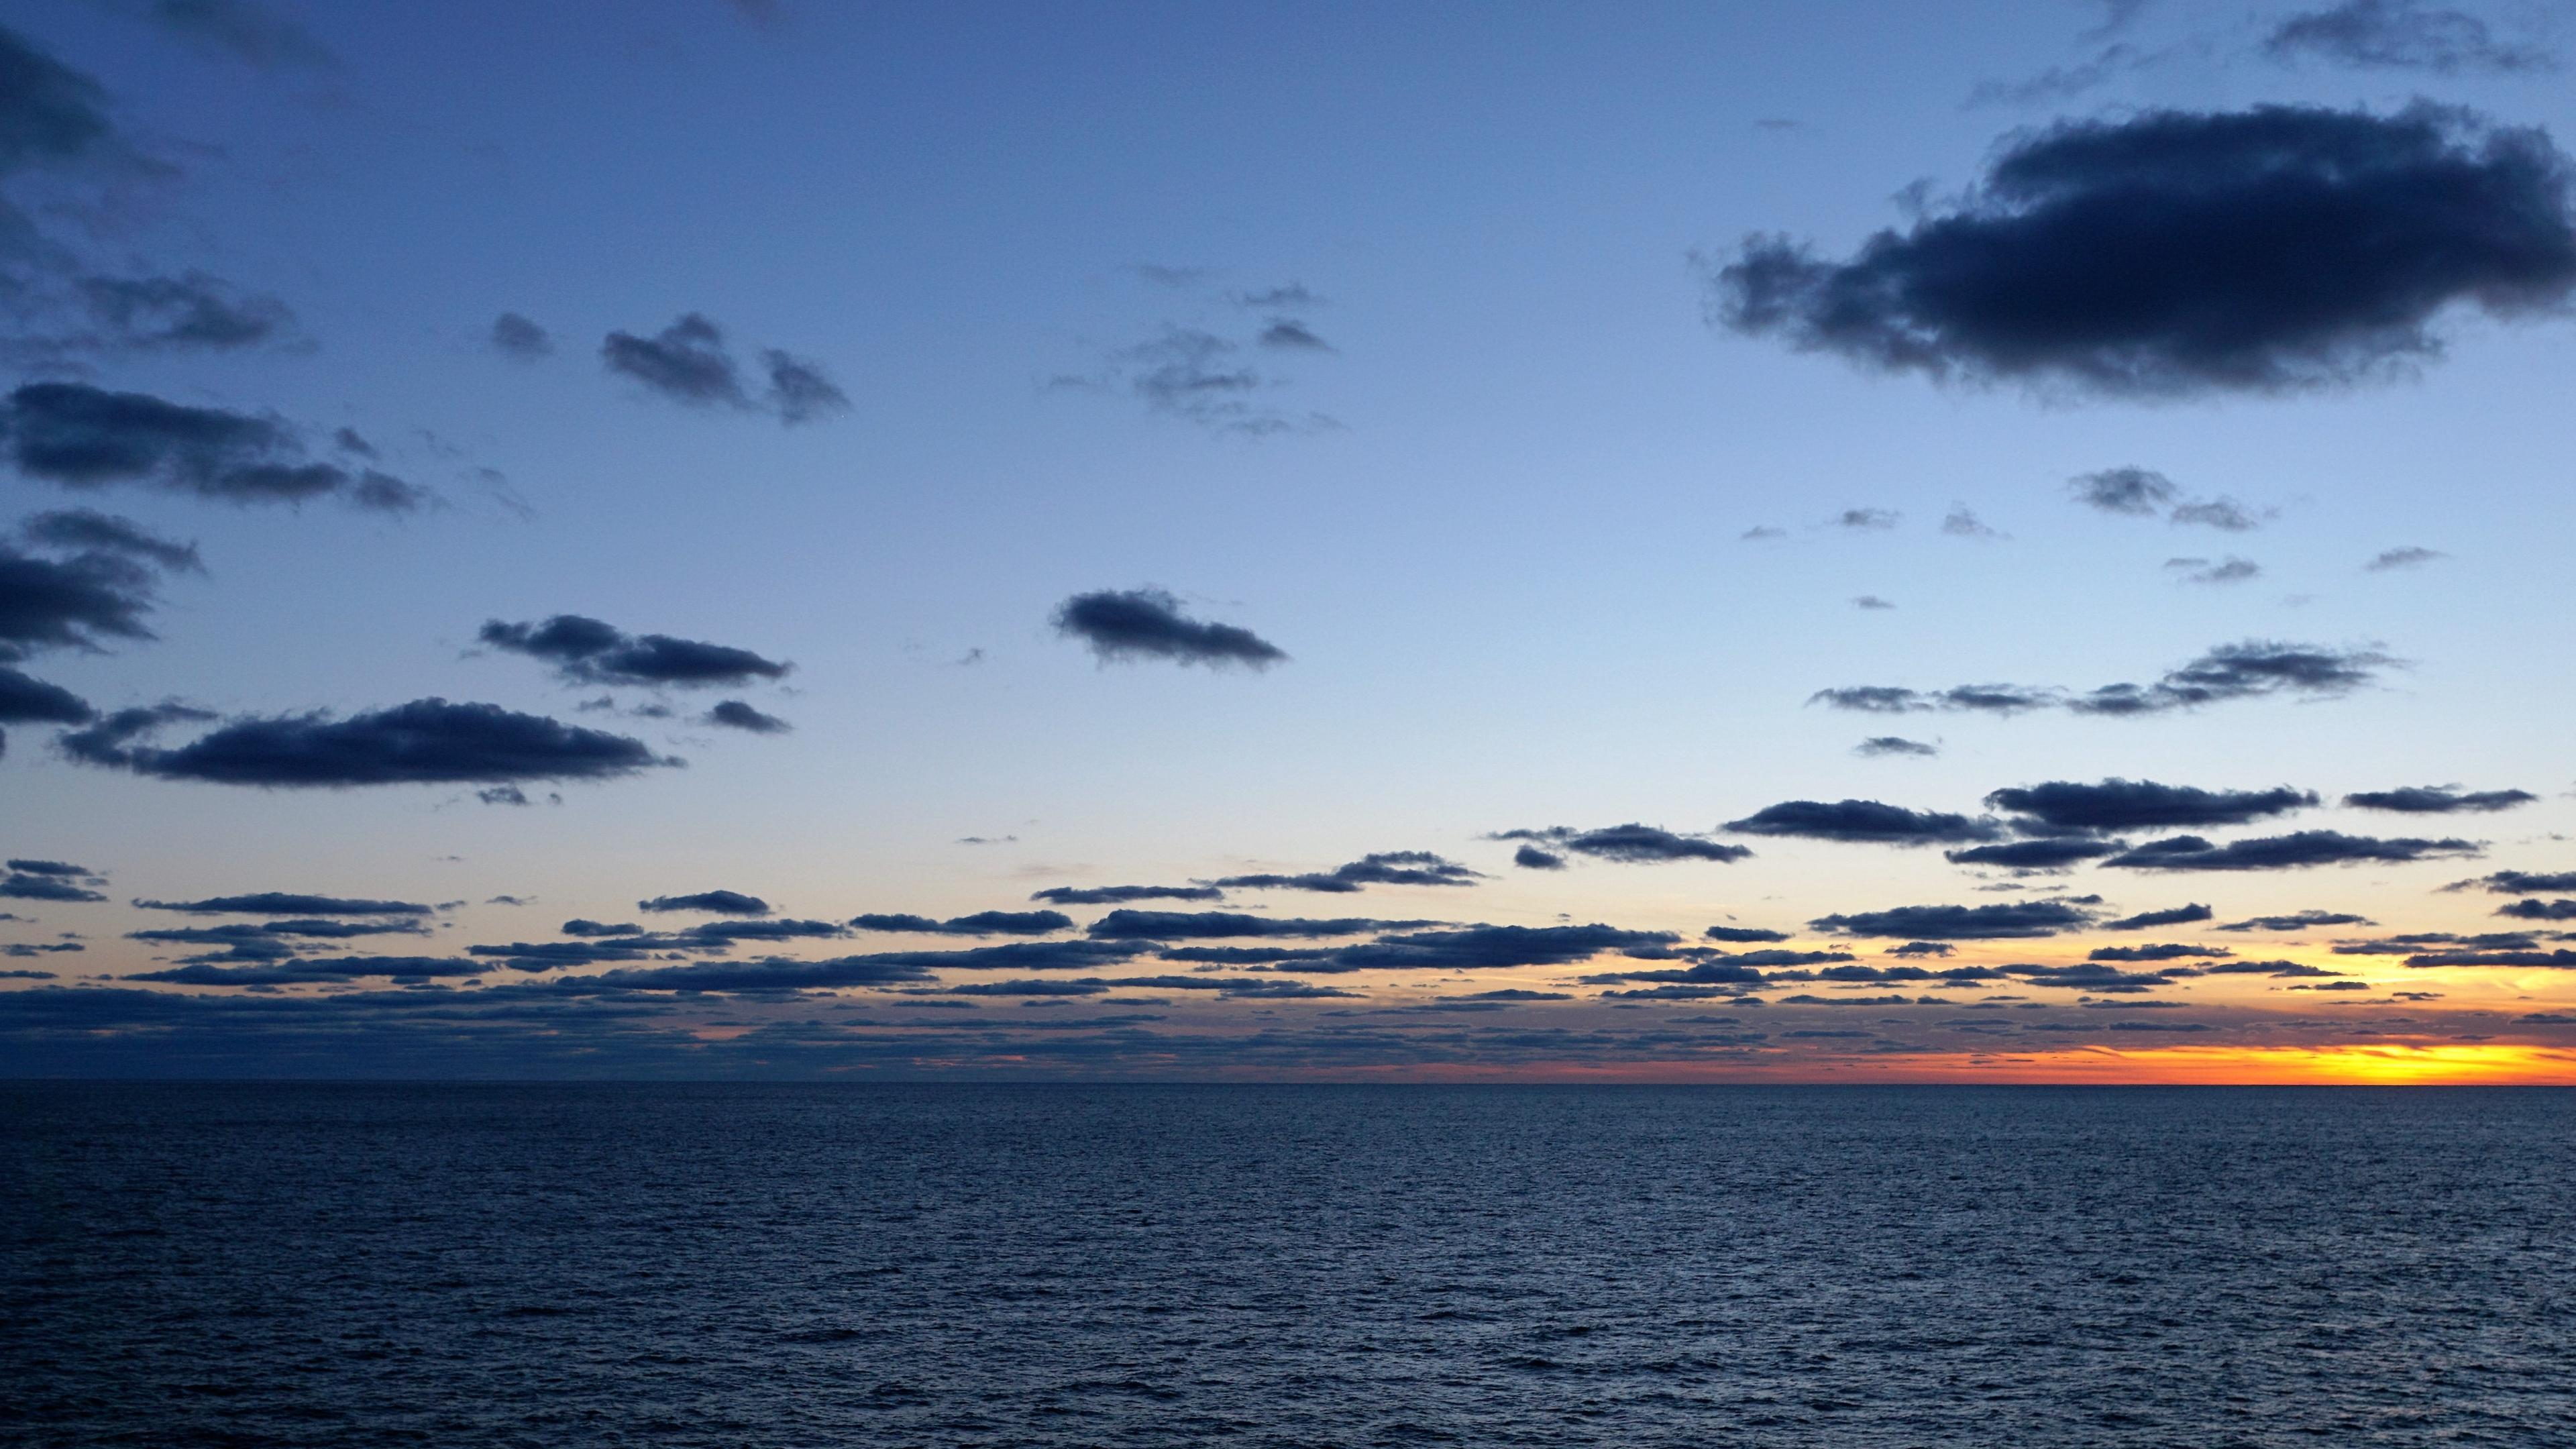 ocean atlantic horizon sunset 4k 1541114058 - ocean, atlantic, horizon, sunset 4k - Ocean, Horizon, Atlantic